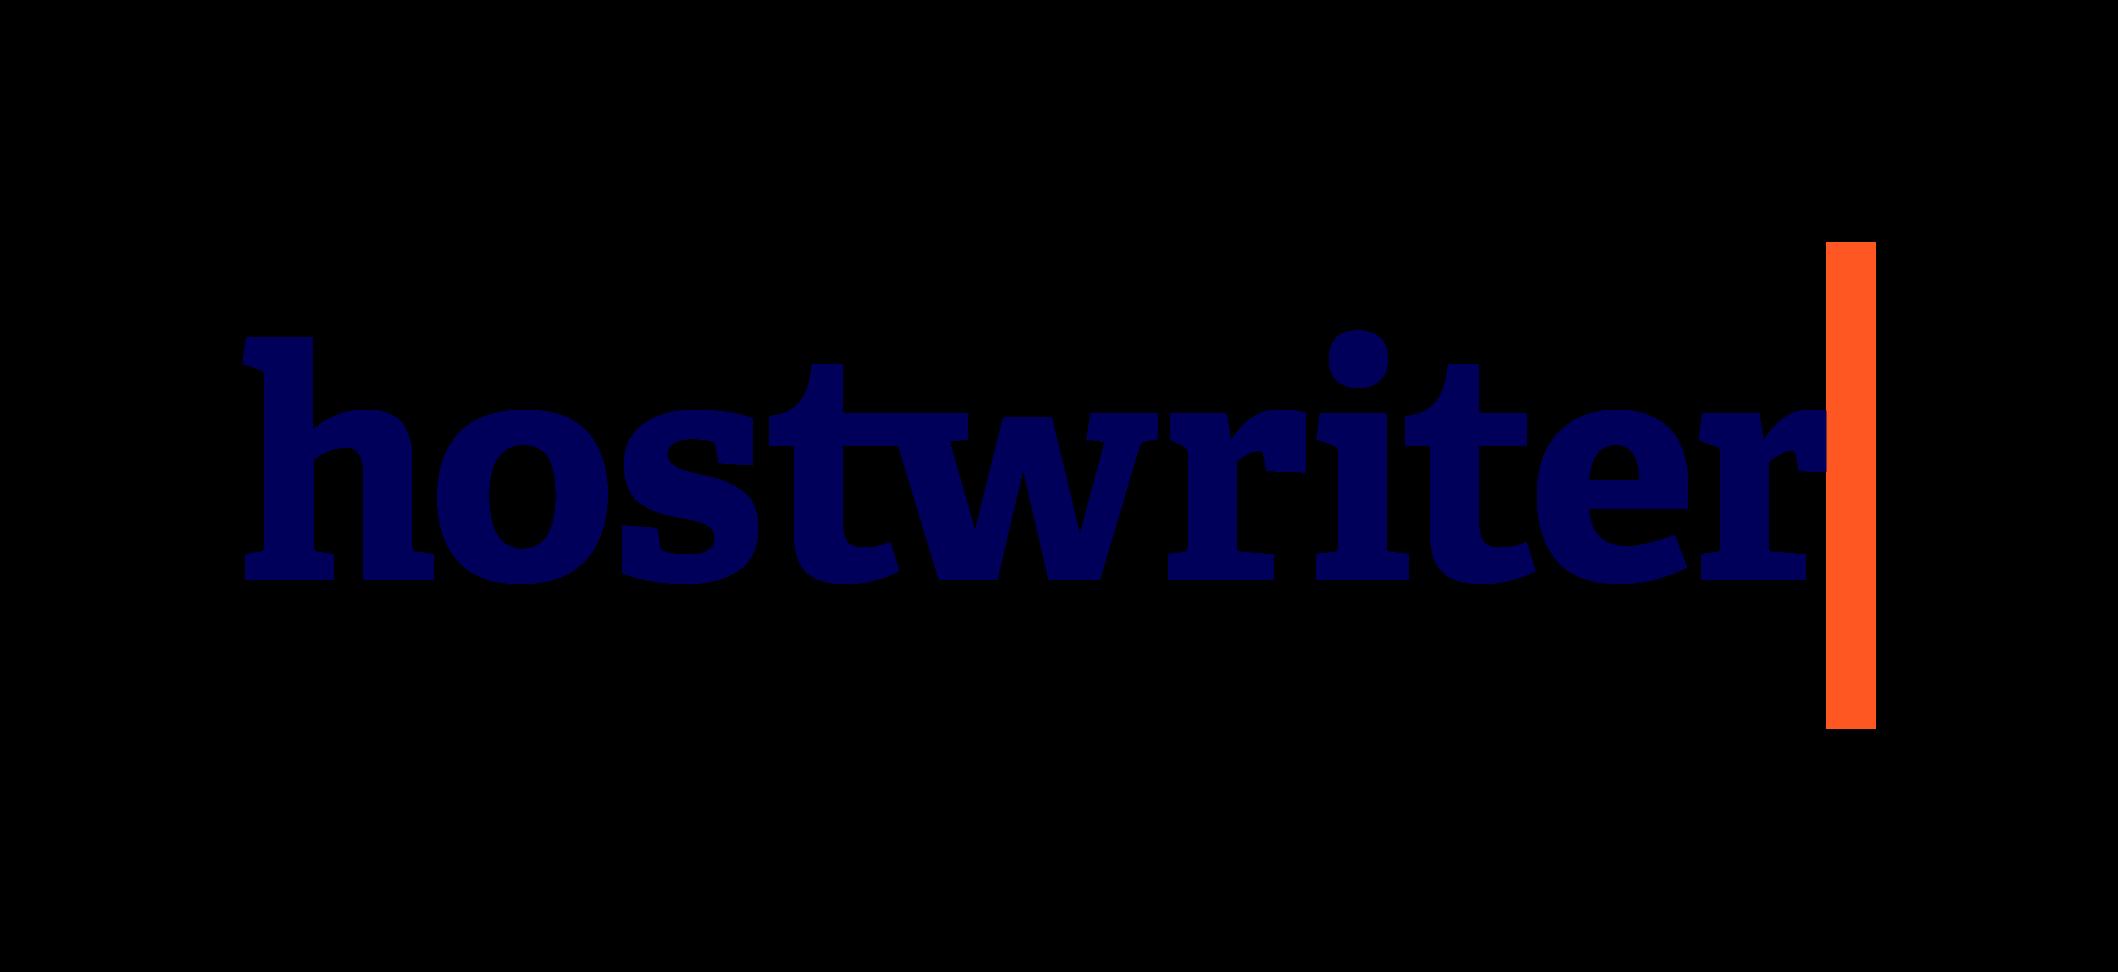 Hostwriter Logo